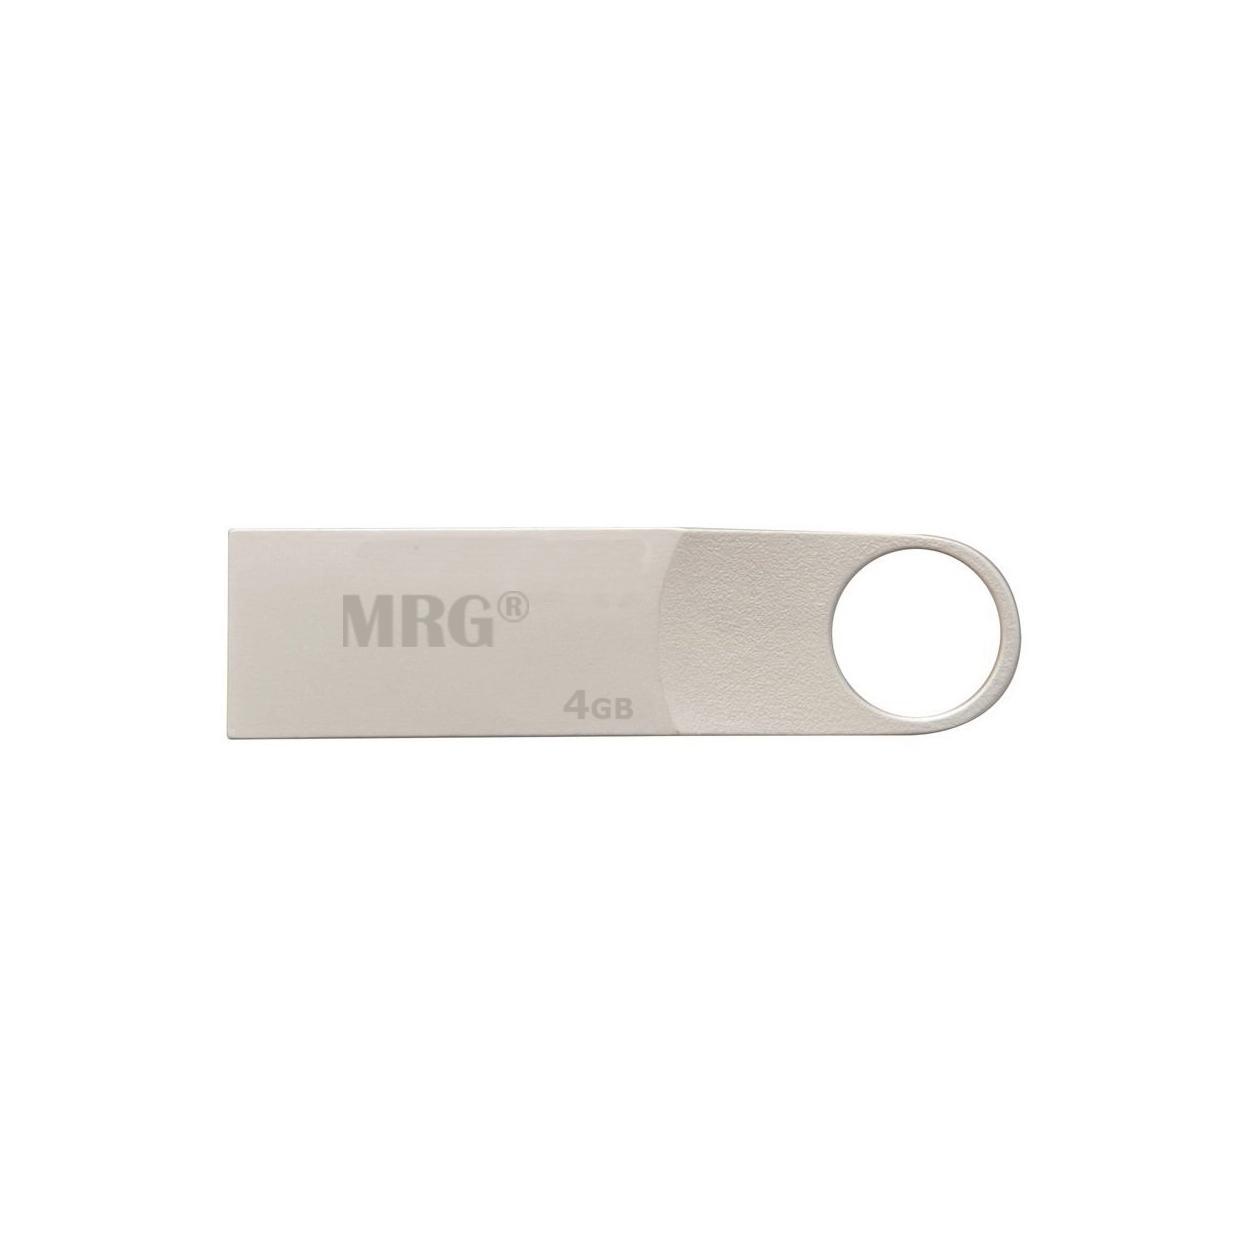 Memorie USB MRG M-SE9, USB 2.0, 4 GB, Gri